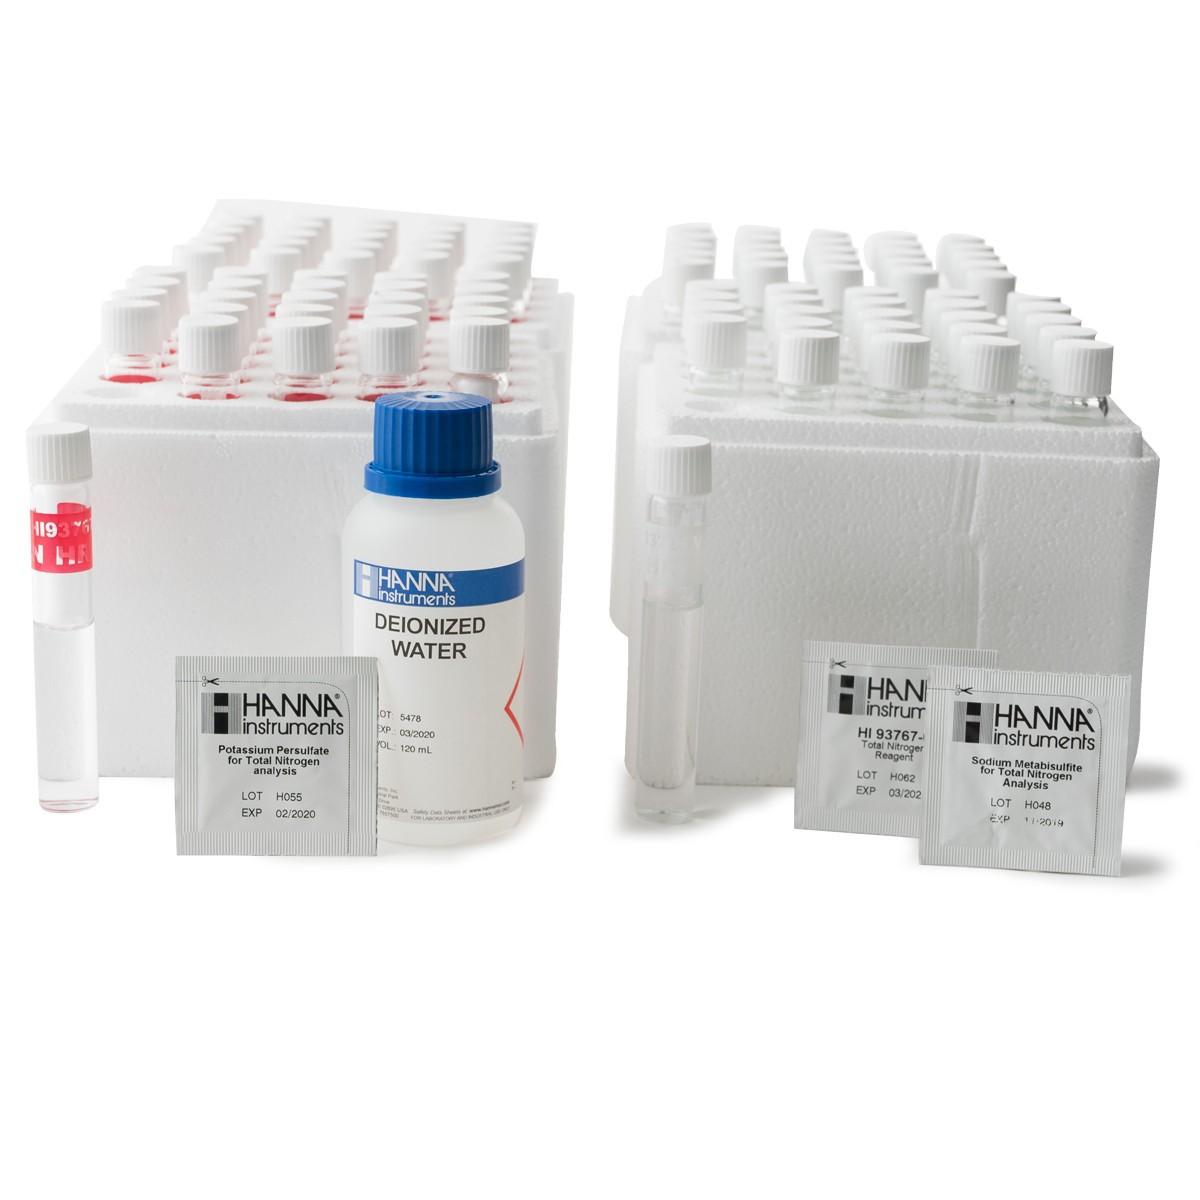 Thuốc Thử Nito Tổng Thang Cao (10-150mg/L) HI93767B-50 Hanna